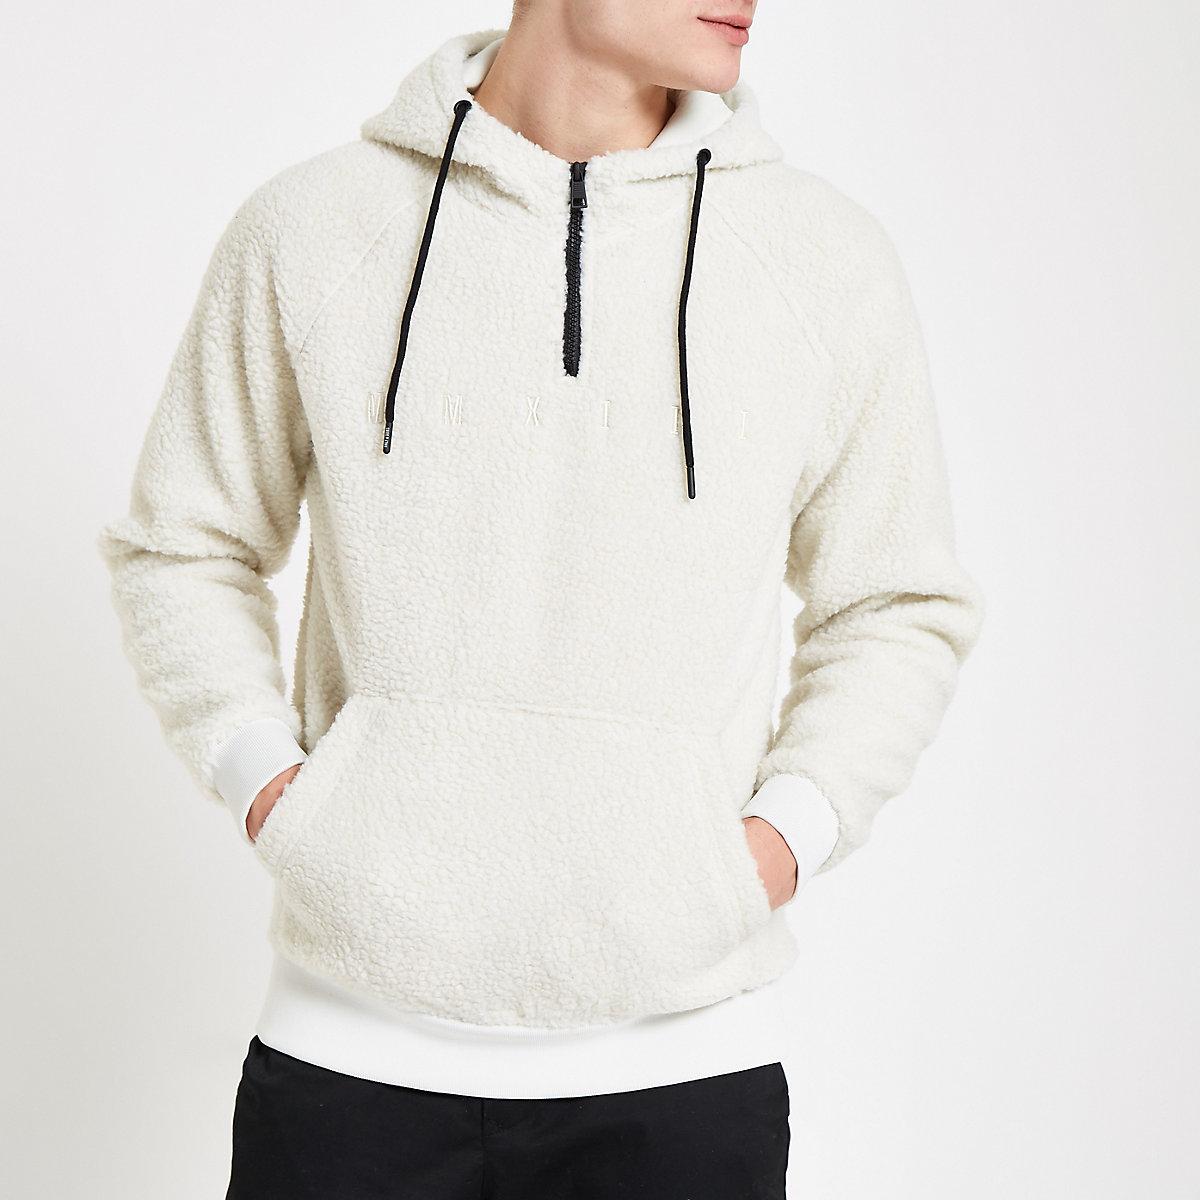 Only & Sons white hooded fleece